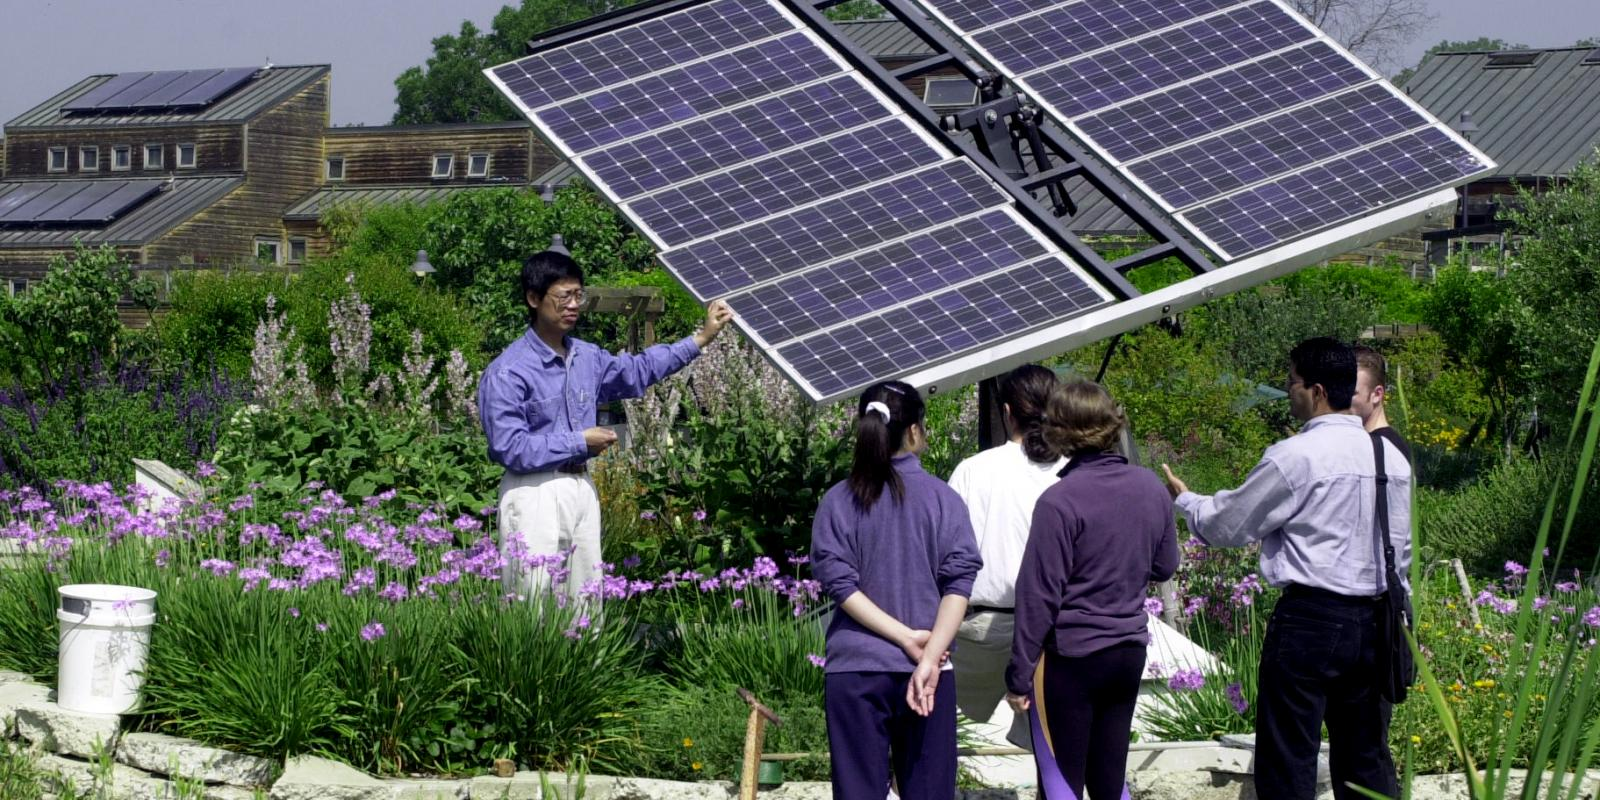 Regenerative Studies students deep in discussion on strategies in solar energy